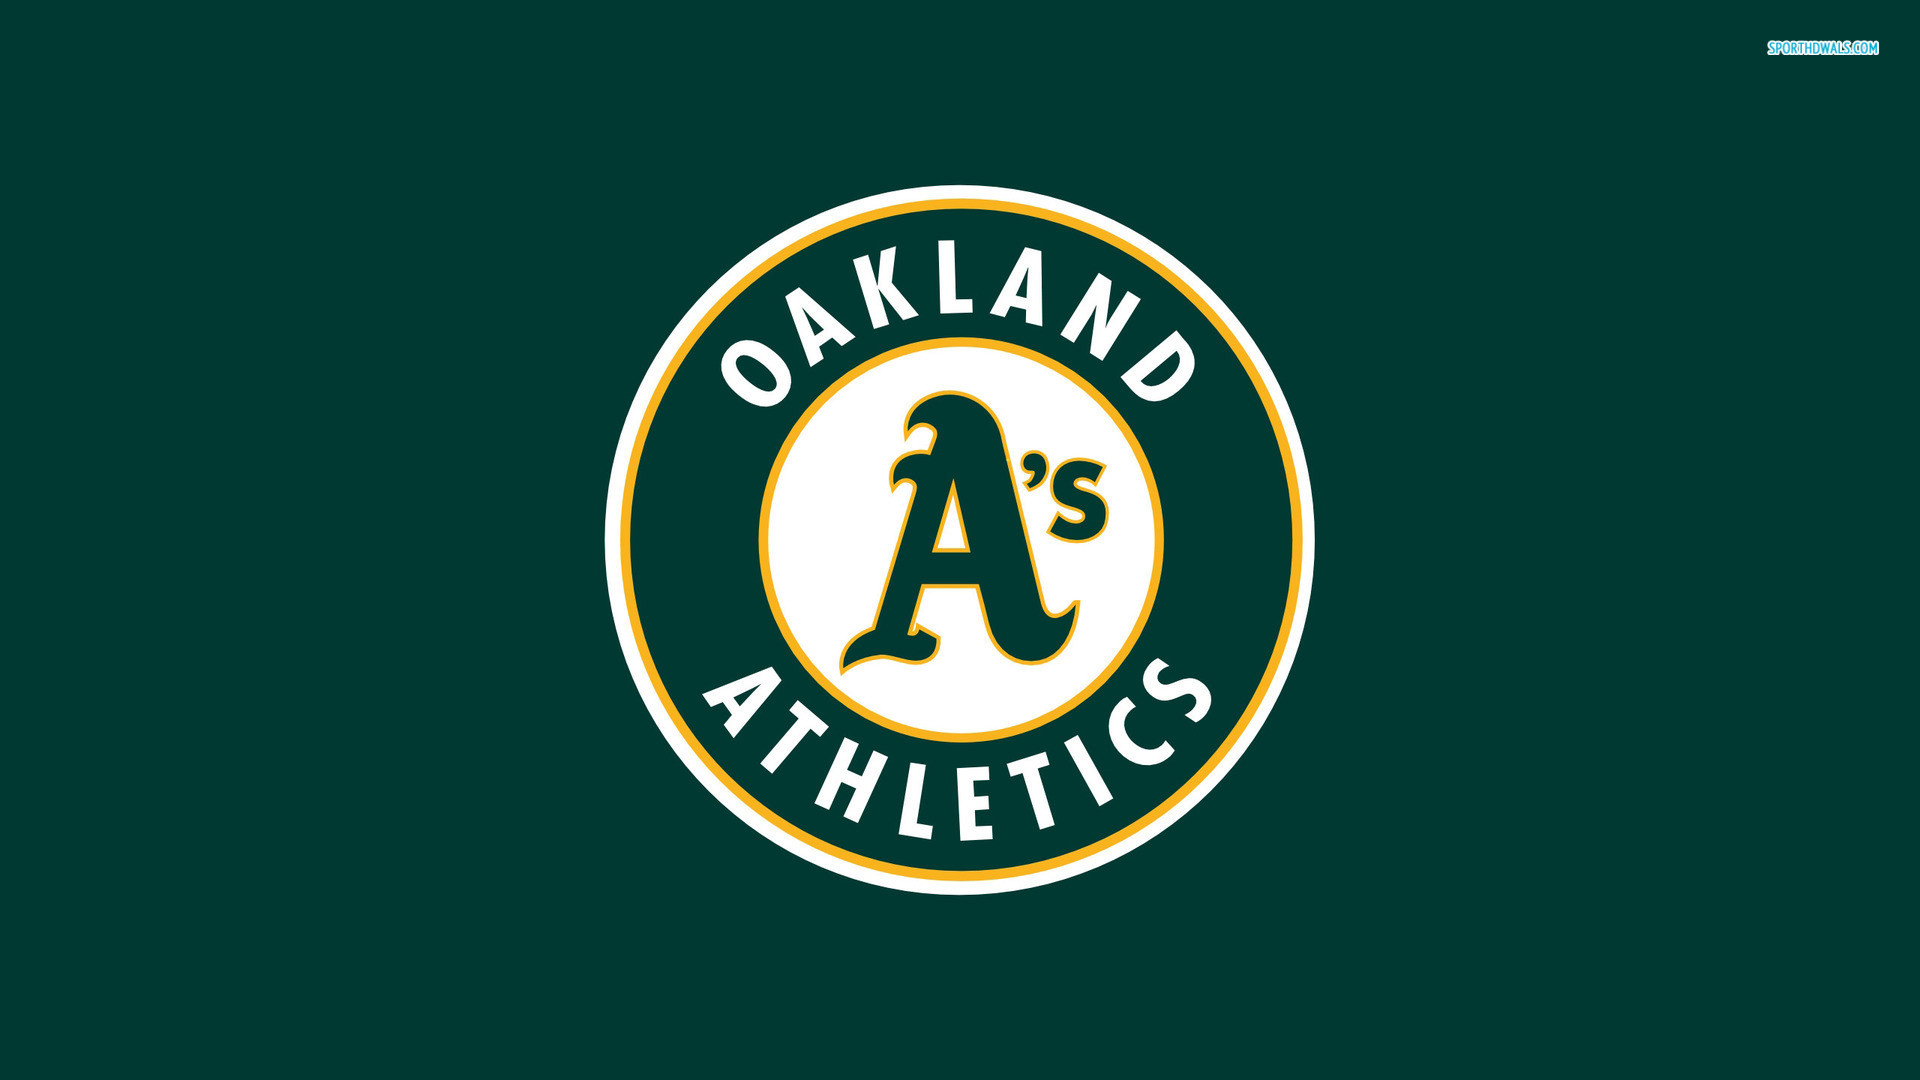 Oakland Raiders Logo Wallpapers Wallpaper 1536×864 Oakland Raiders  Wallpapers (36 Wallpapers) | Adorable Wallpapers | Desktop | Pinterest |  Raiders …